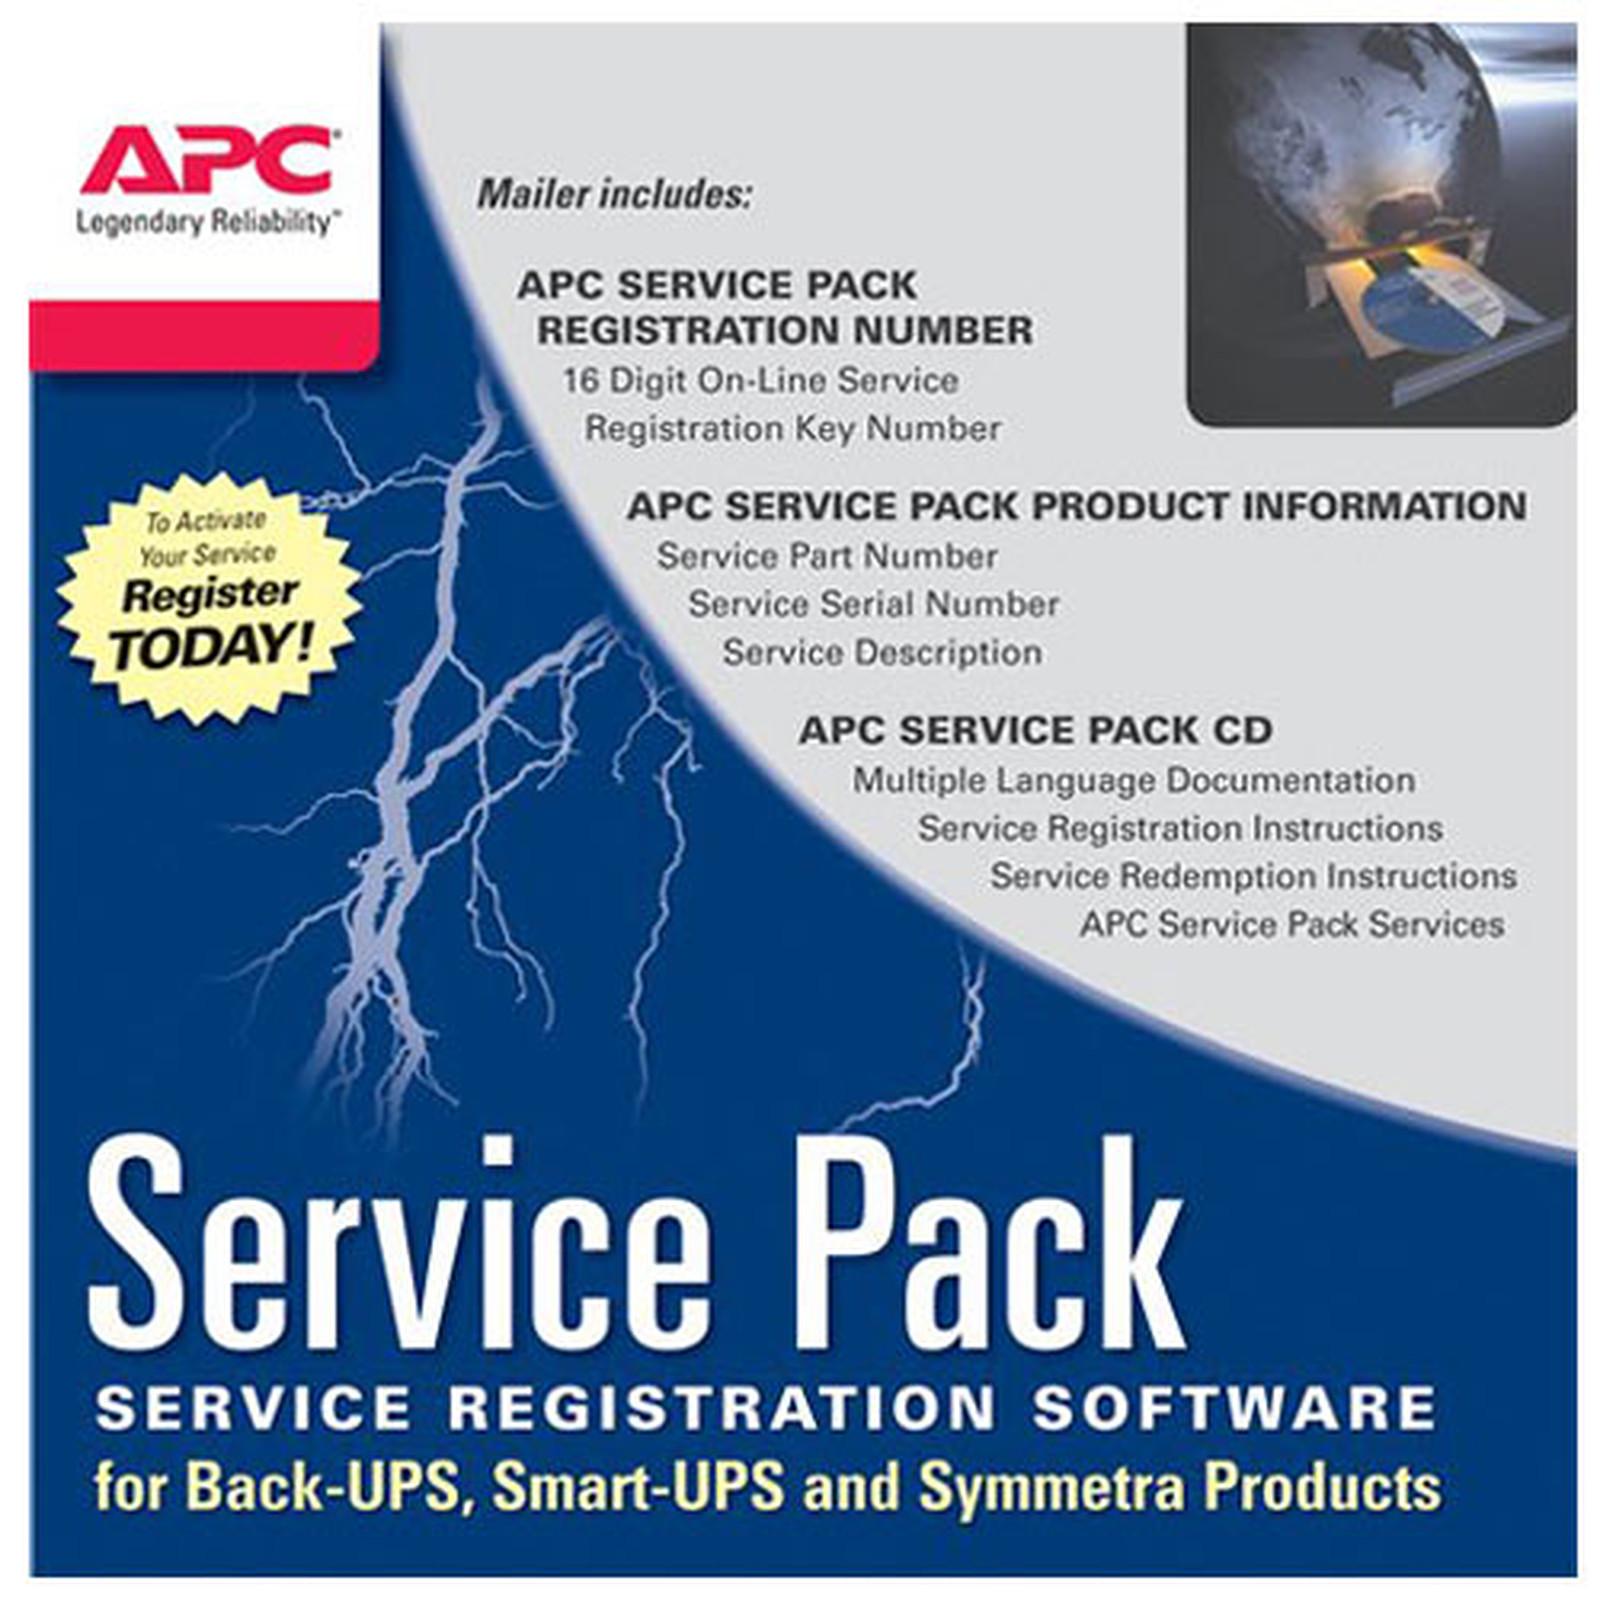 APC Extension de garantie 3 ans (WBEXTWAR3YR-SP-04)